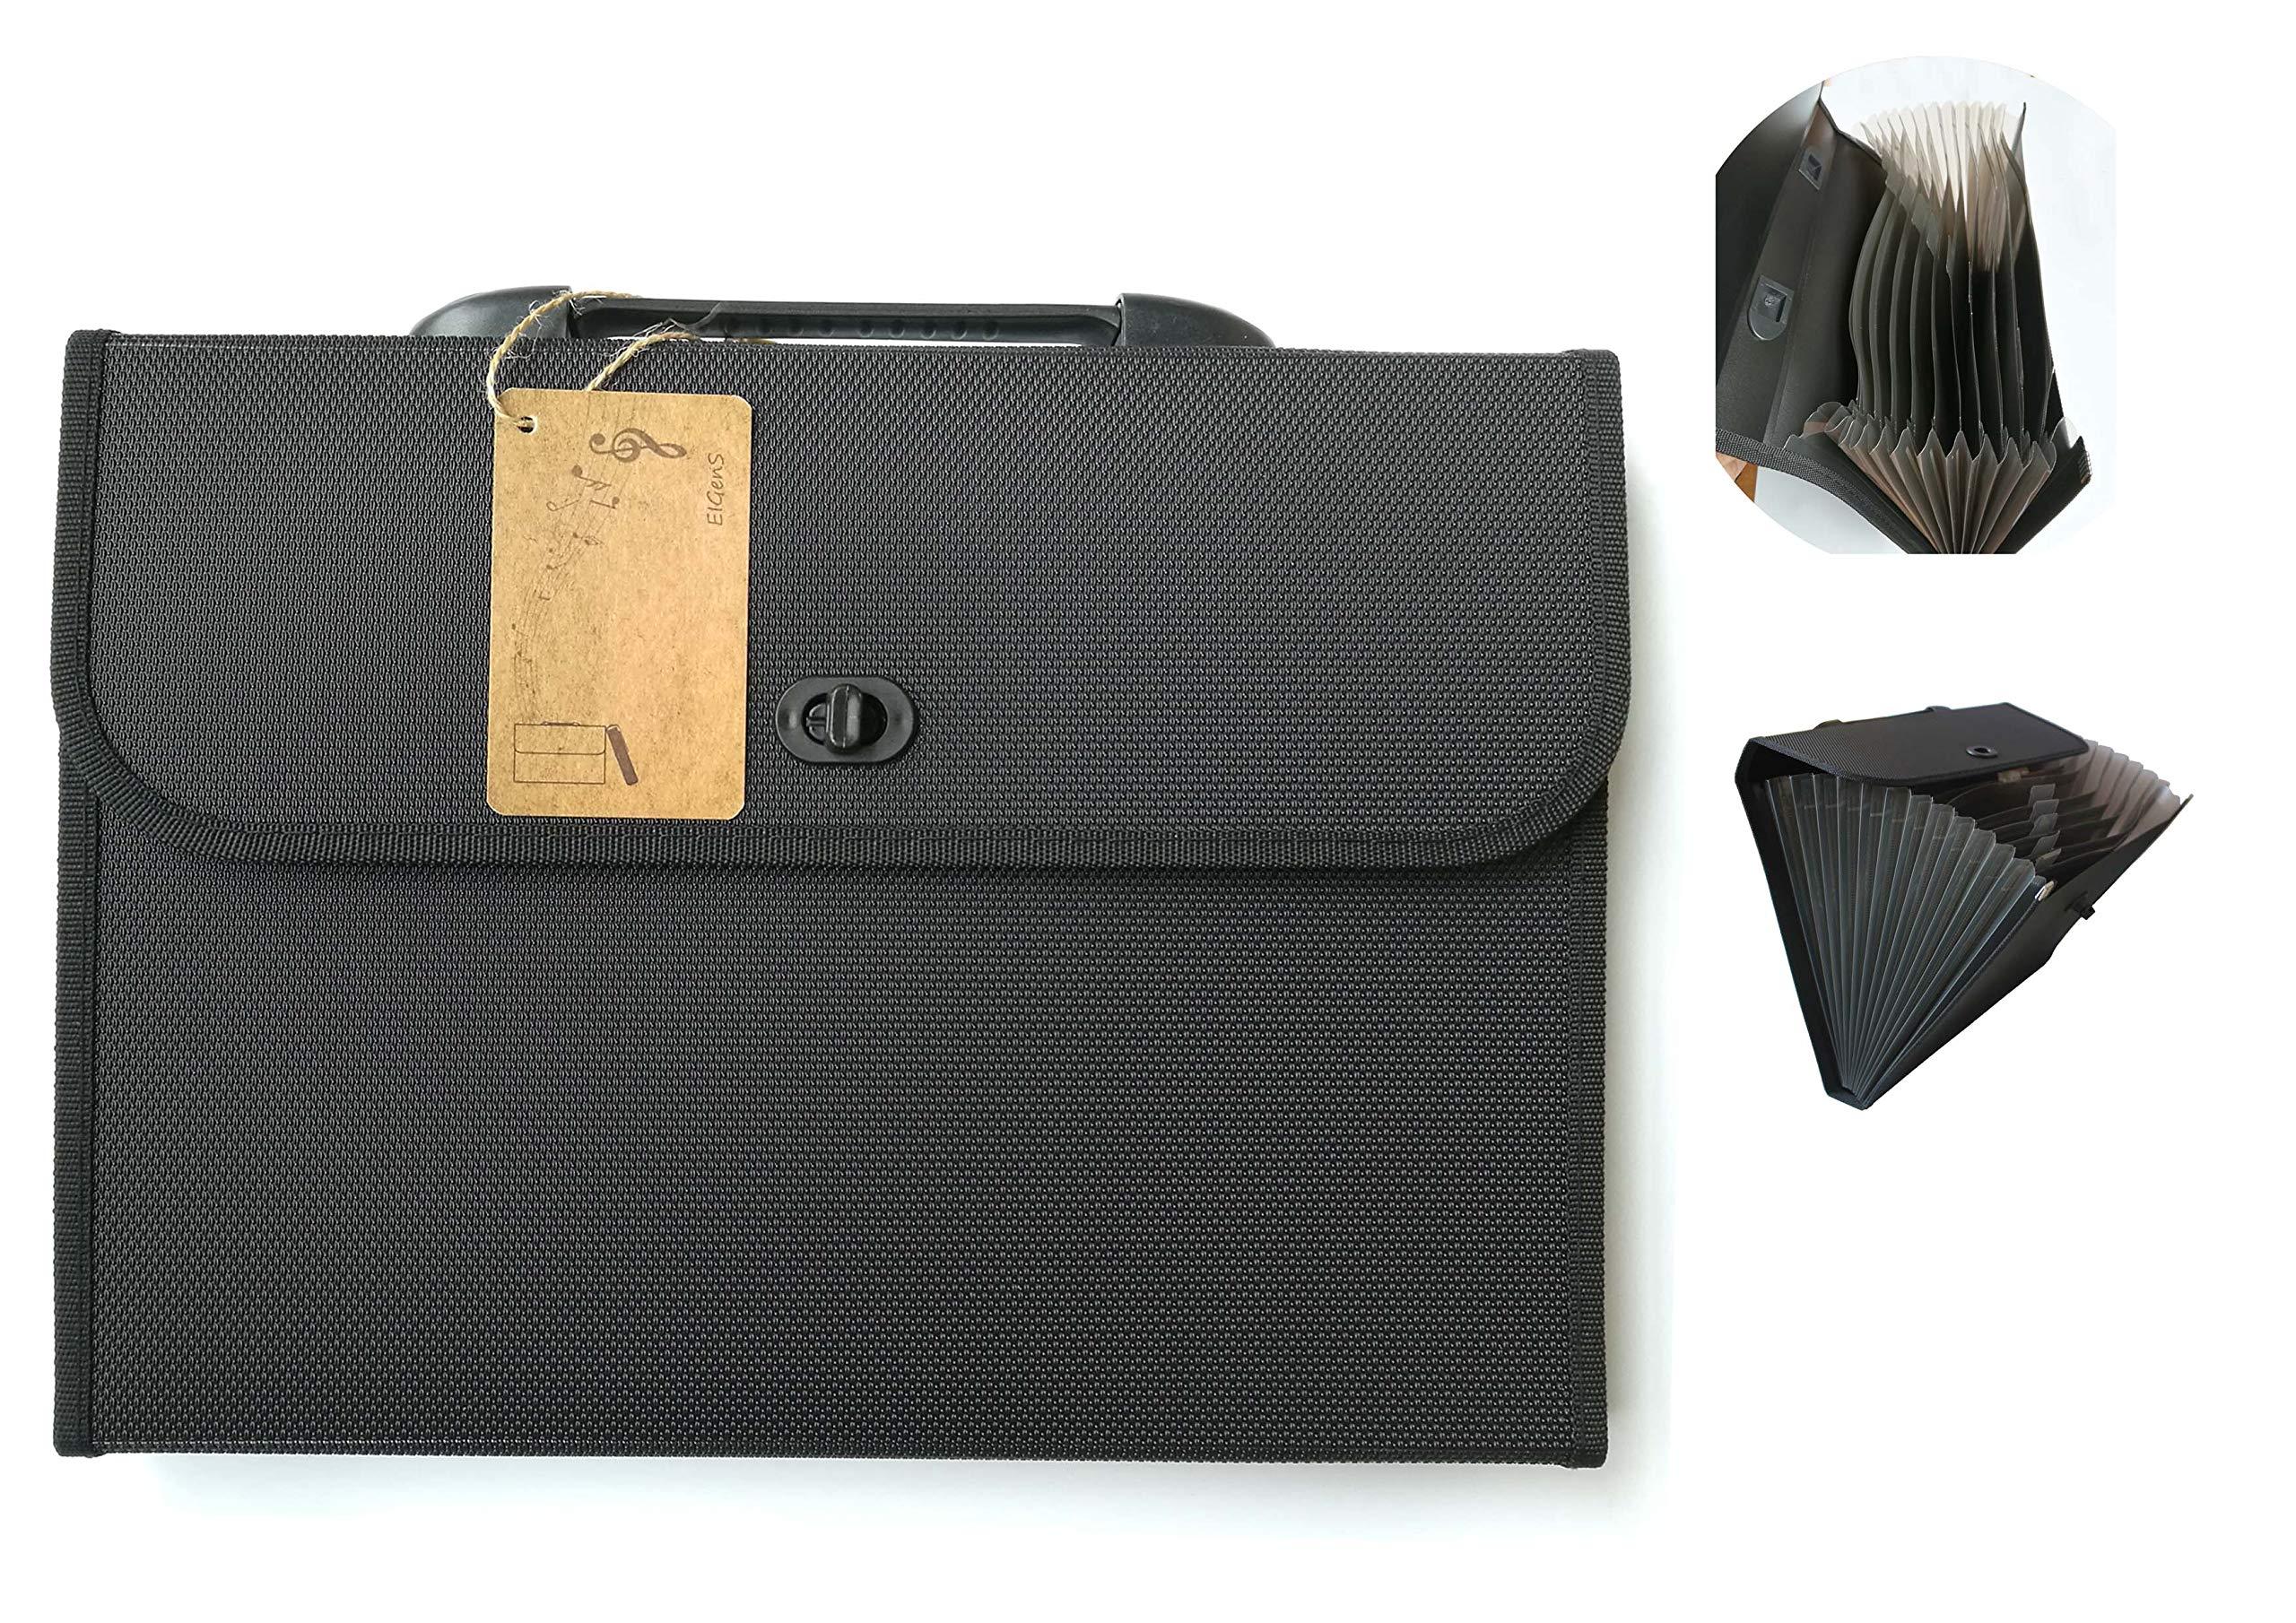 EIGenS 13 Pockets Expanding File Folder with Handle - A4 Size Expandable File Organizer File Folder Wallet Briefcase Documents Filing